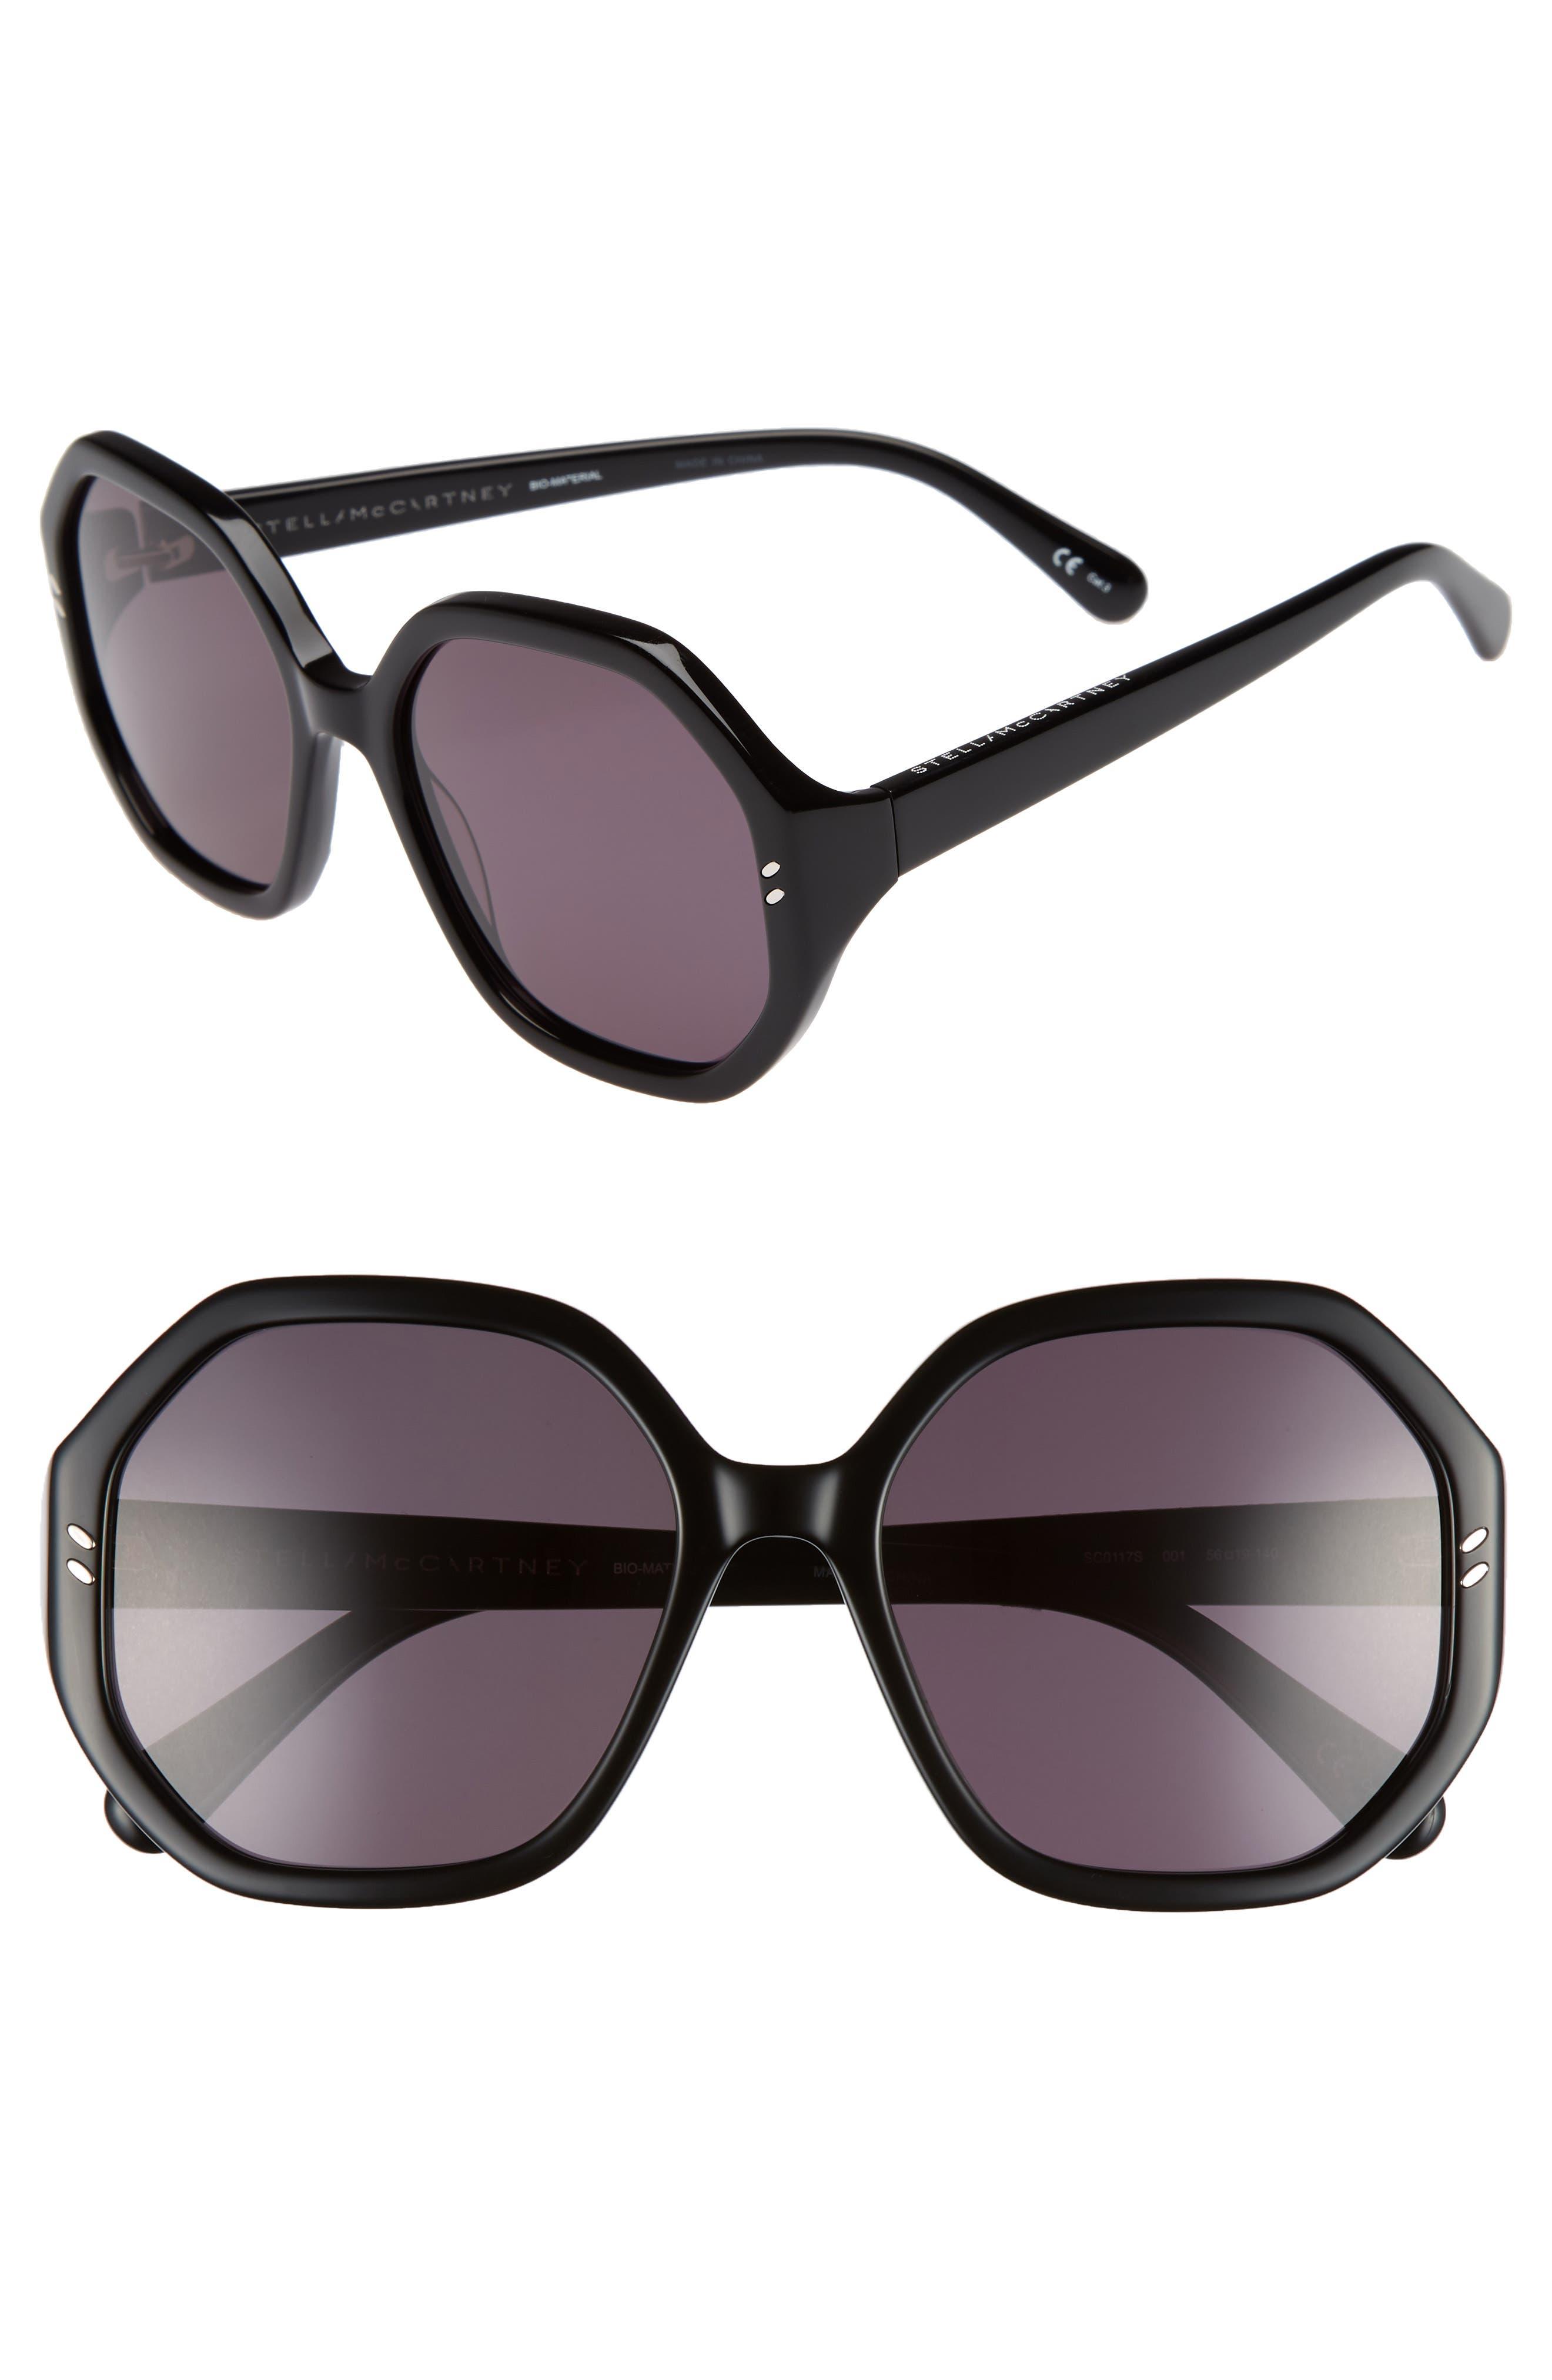 Stella McCartney 56mm Hexagonal Sunglasses